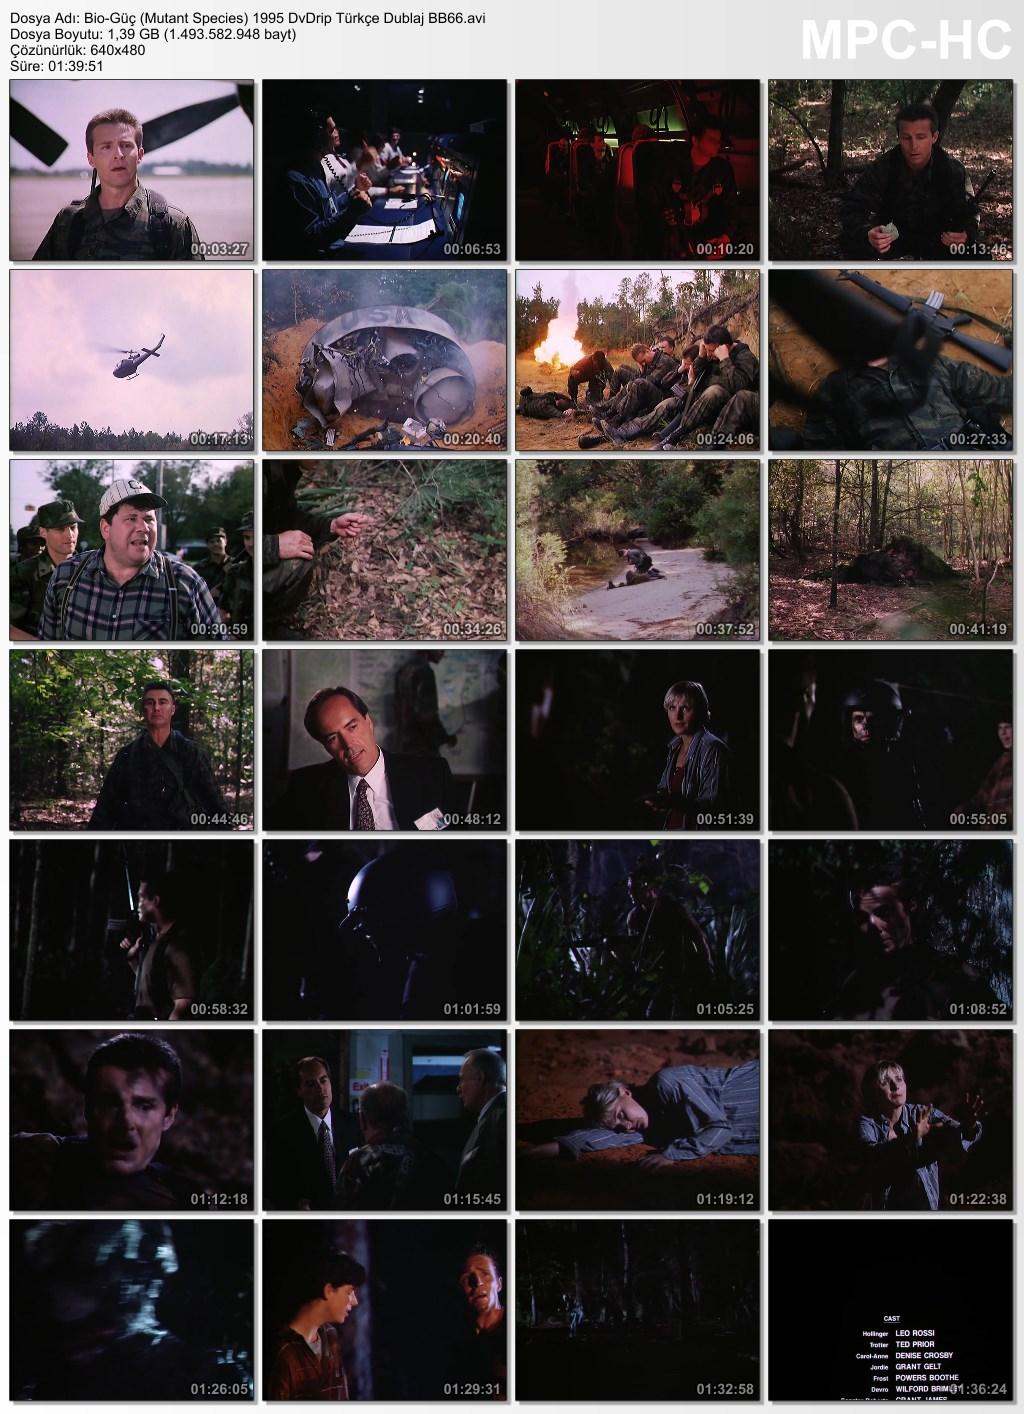 Bio-Güç (Mutant Species) 1995 DvDrip Türkçe Dublaj BB66 - barbarus